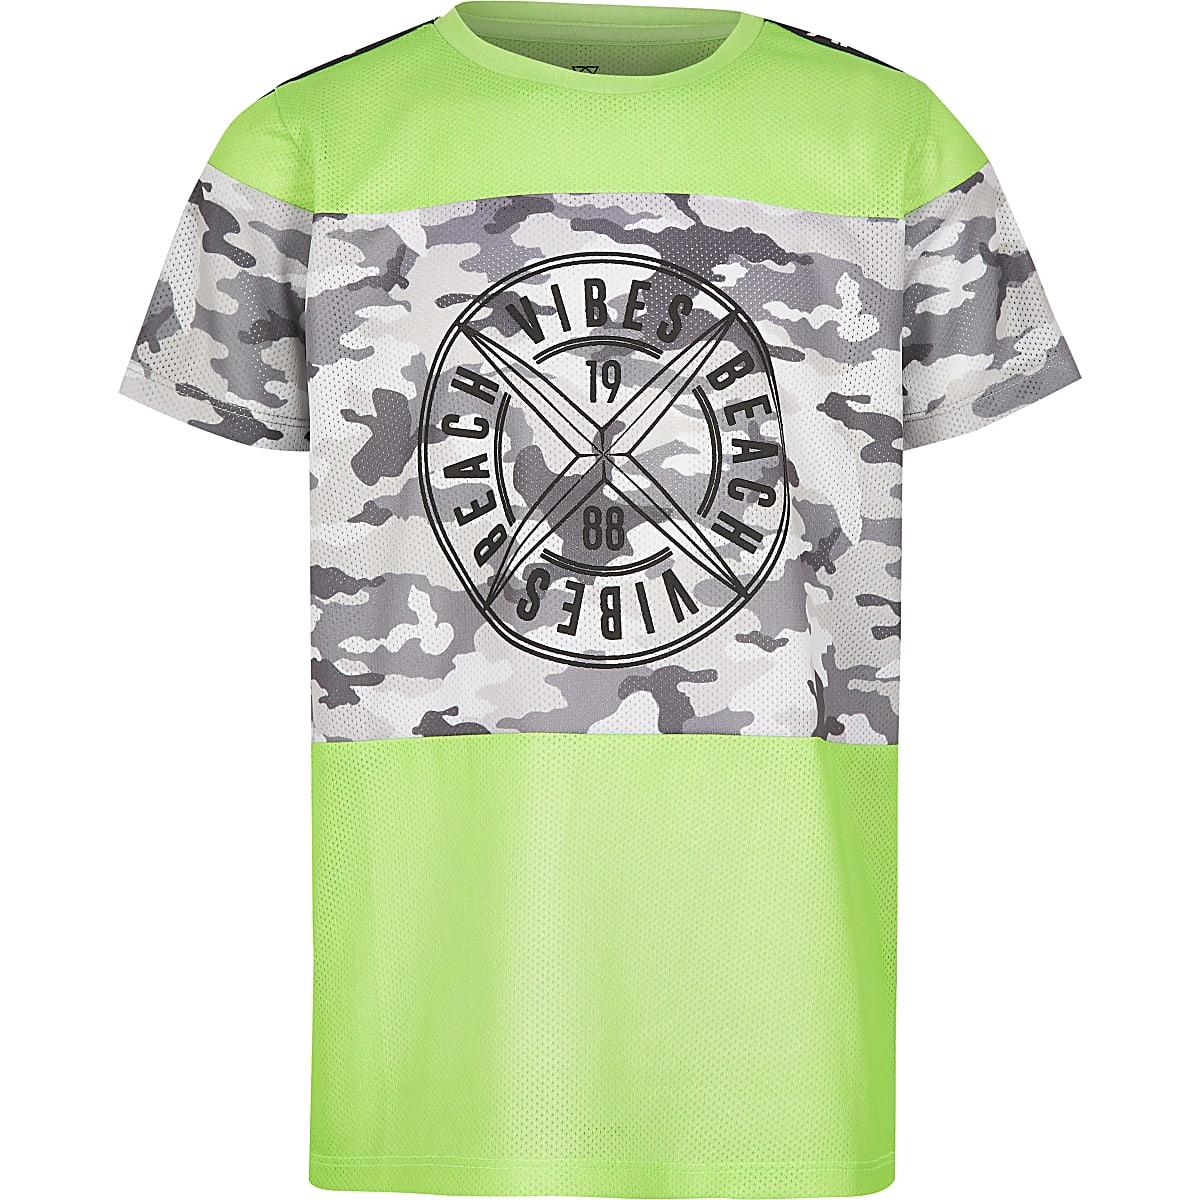 Boys neon green camo mesh T-shirt